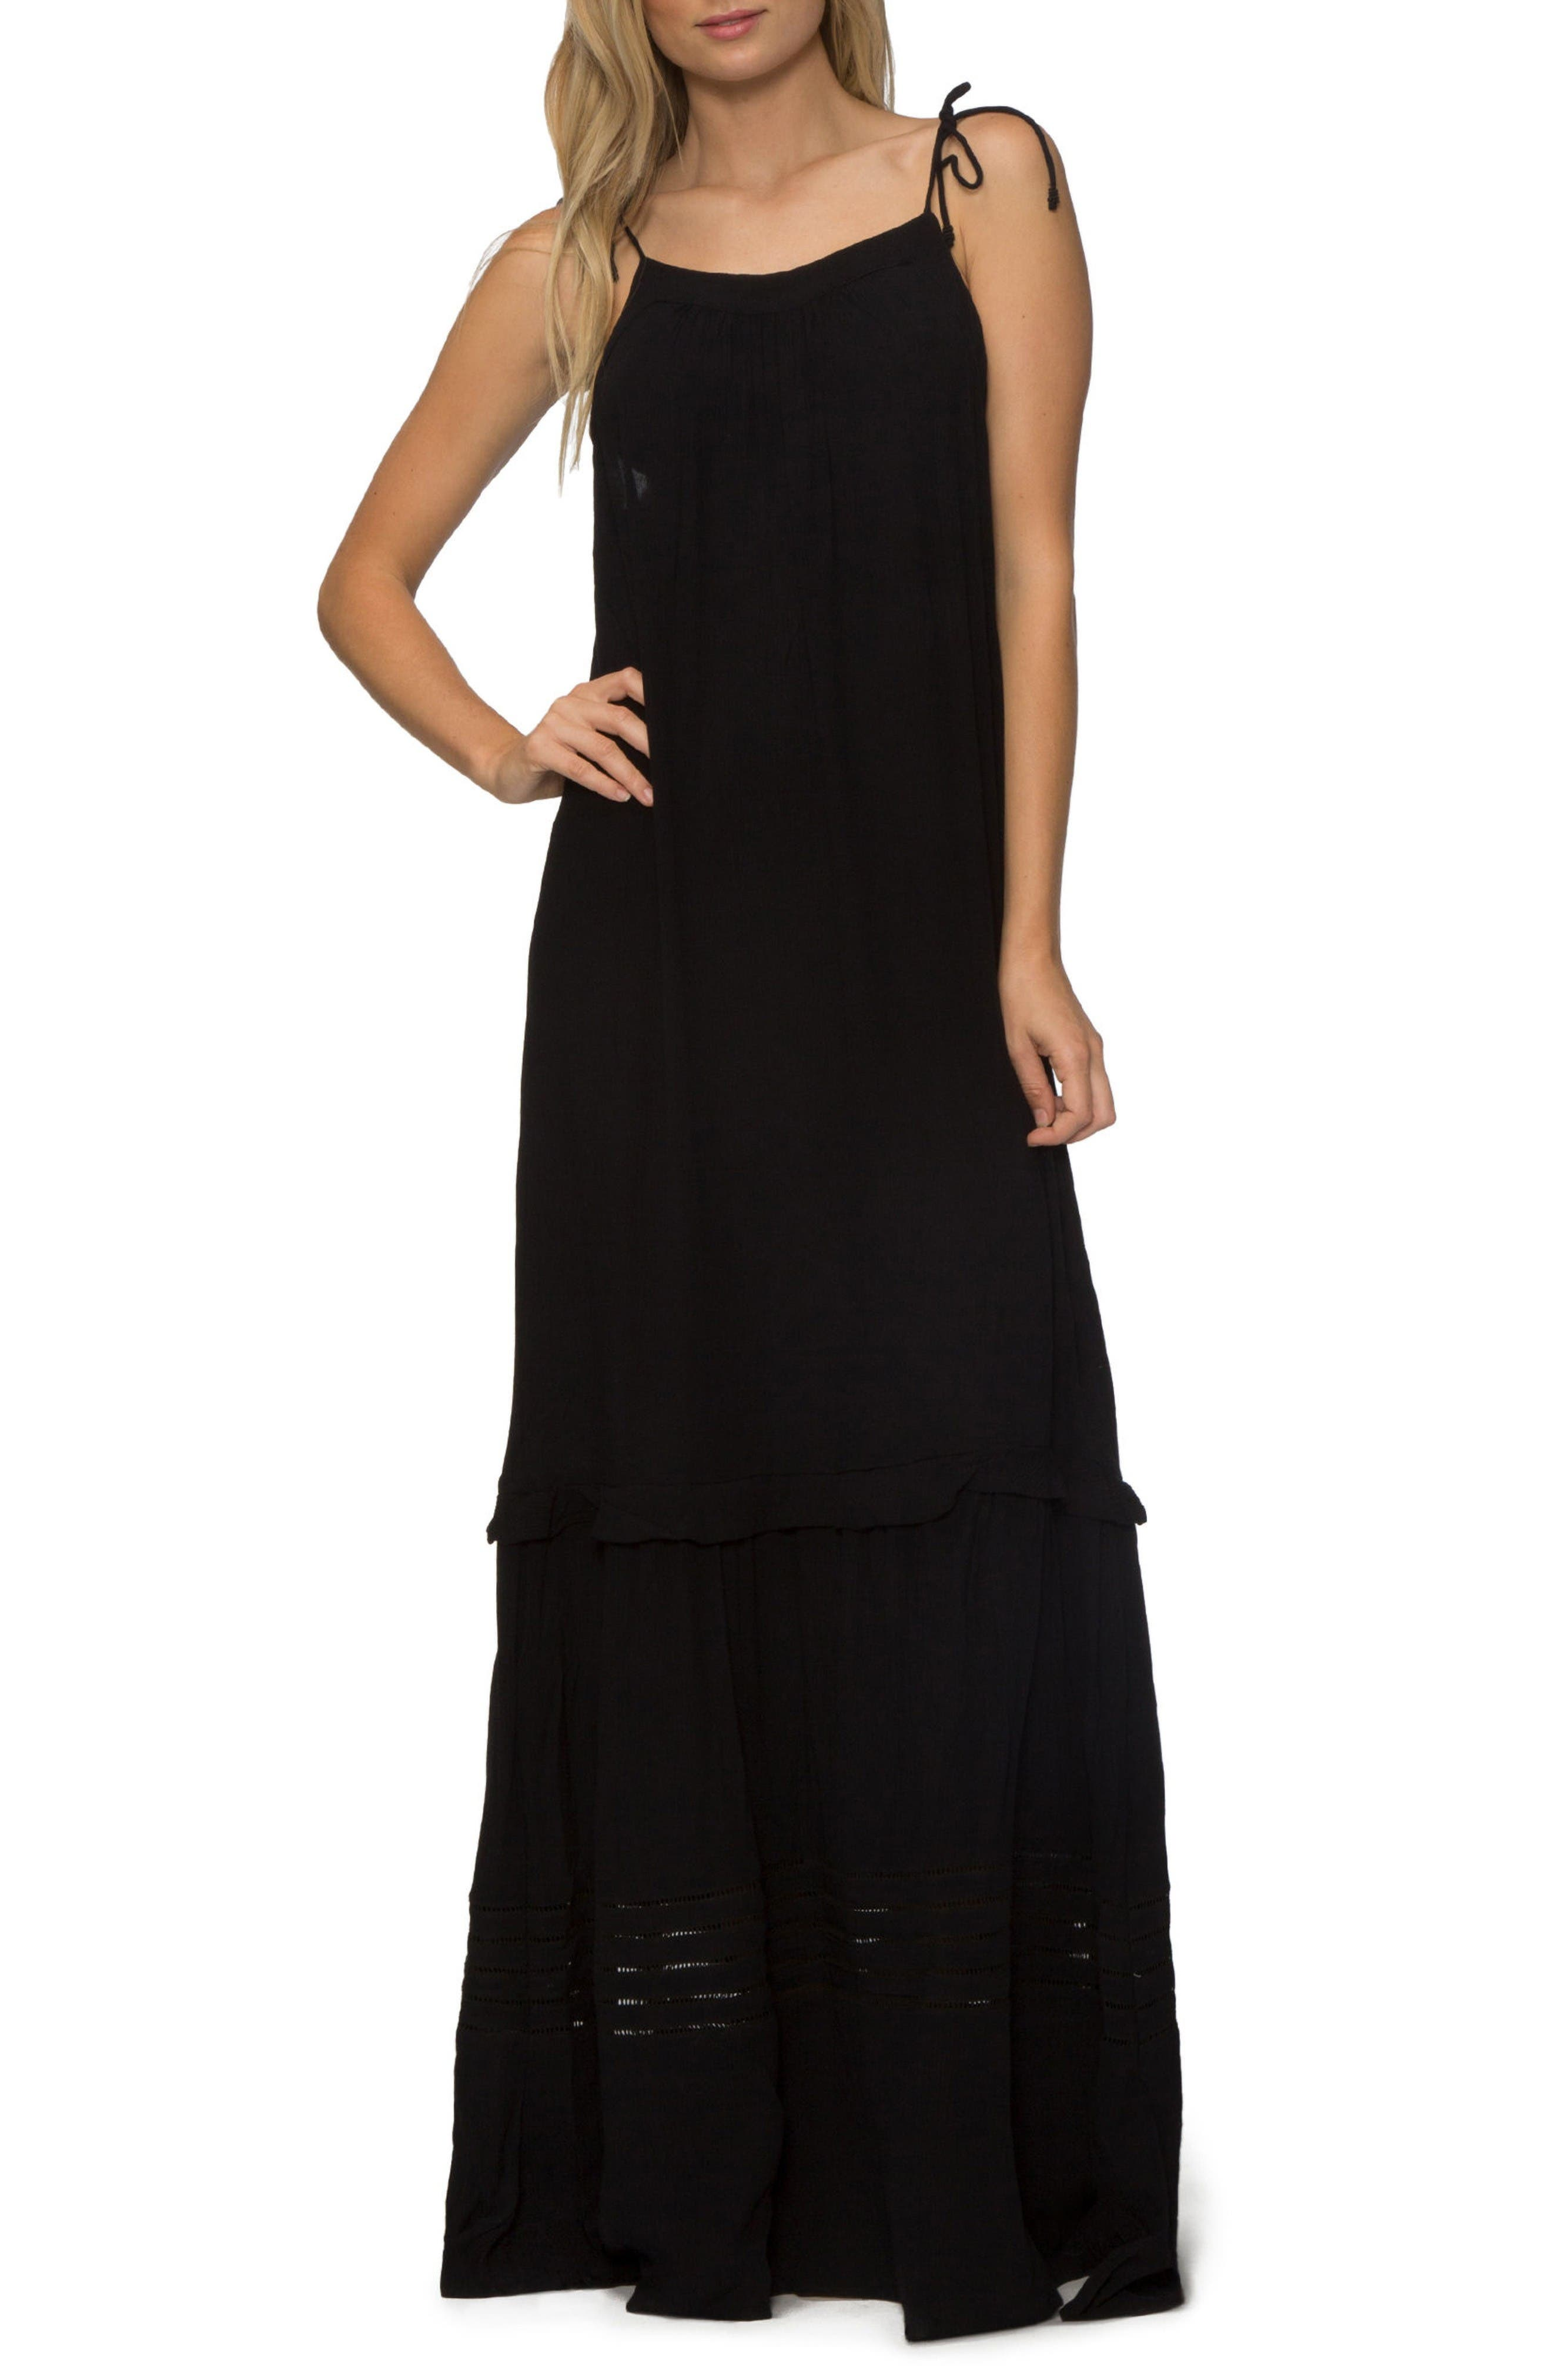 TAVIK Moonlight Cover-Up Maxi Dress